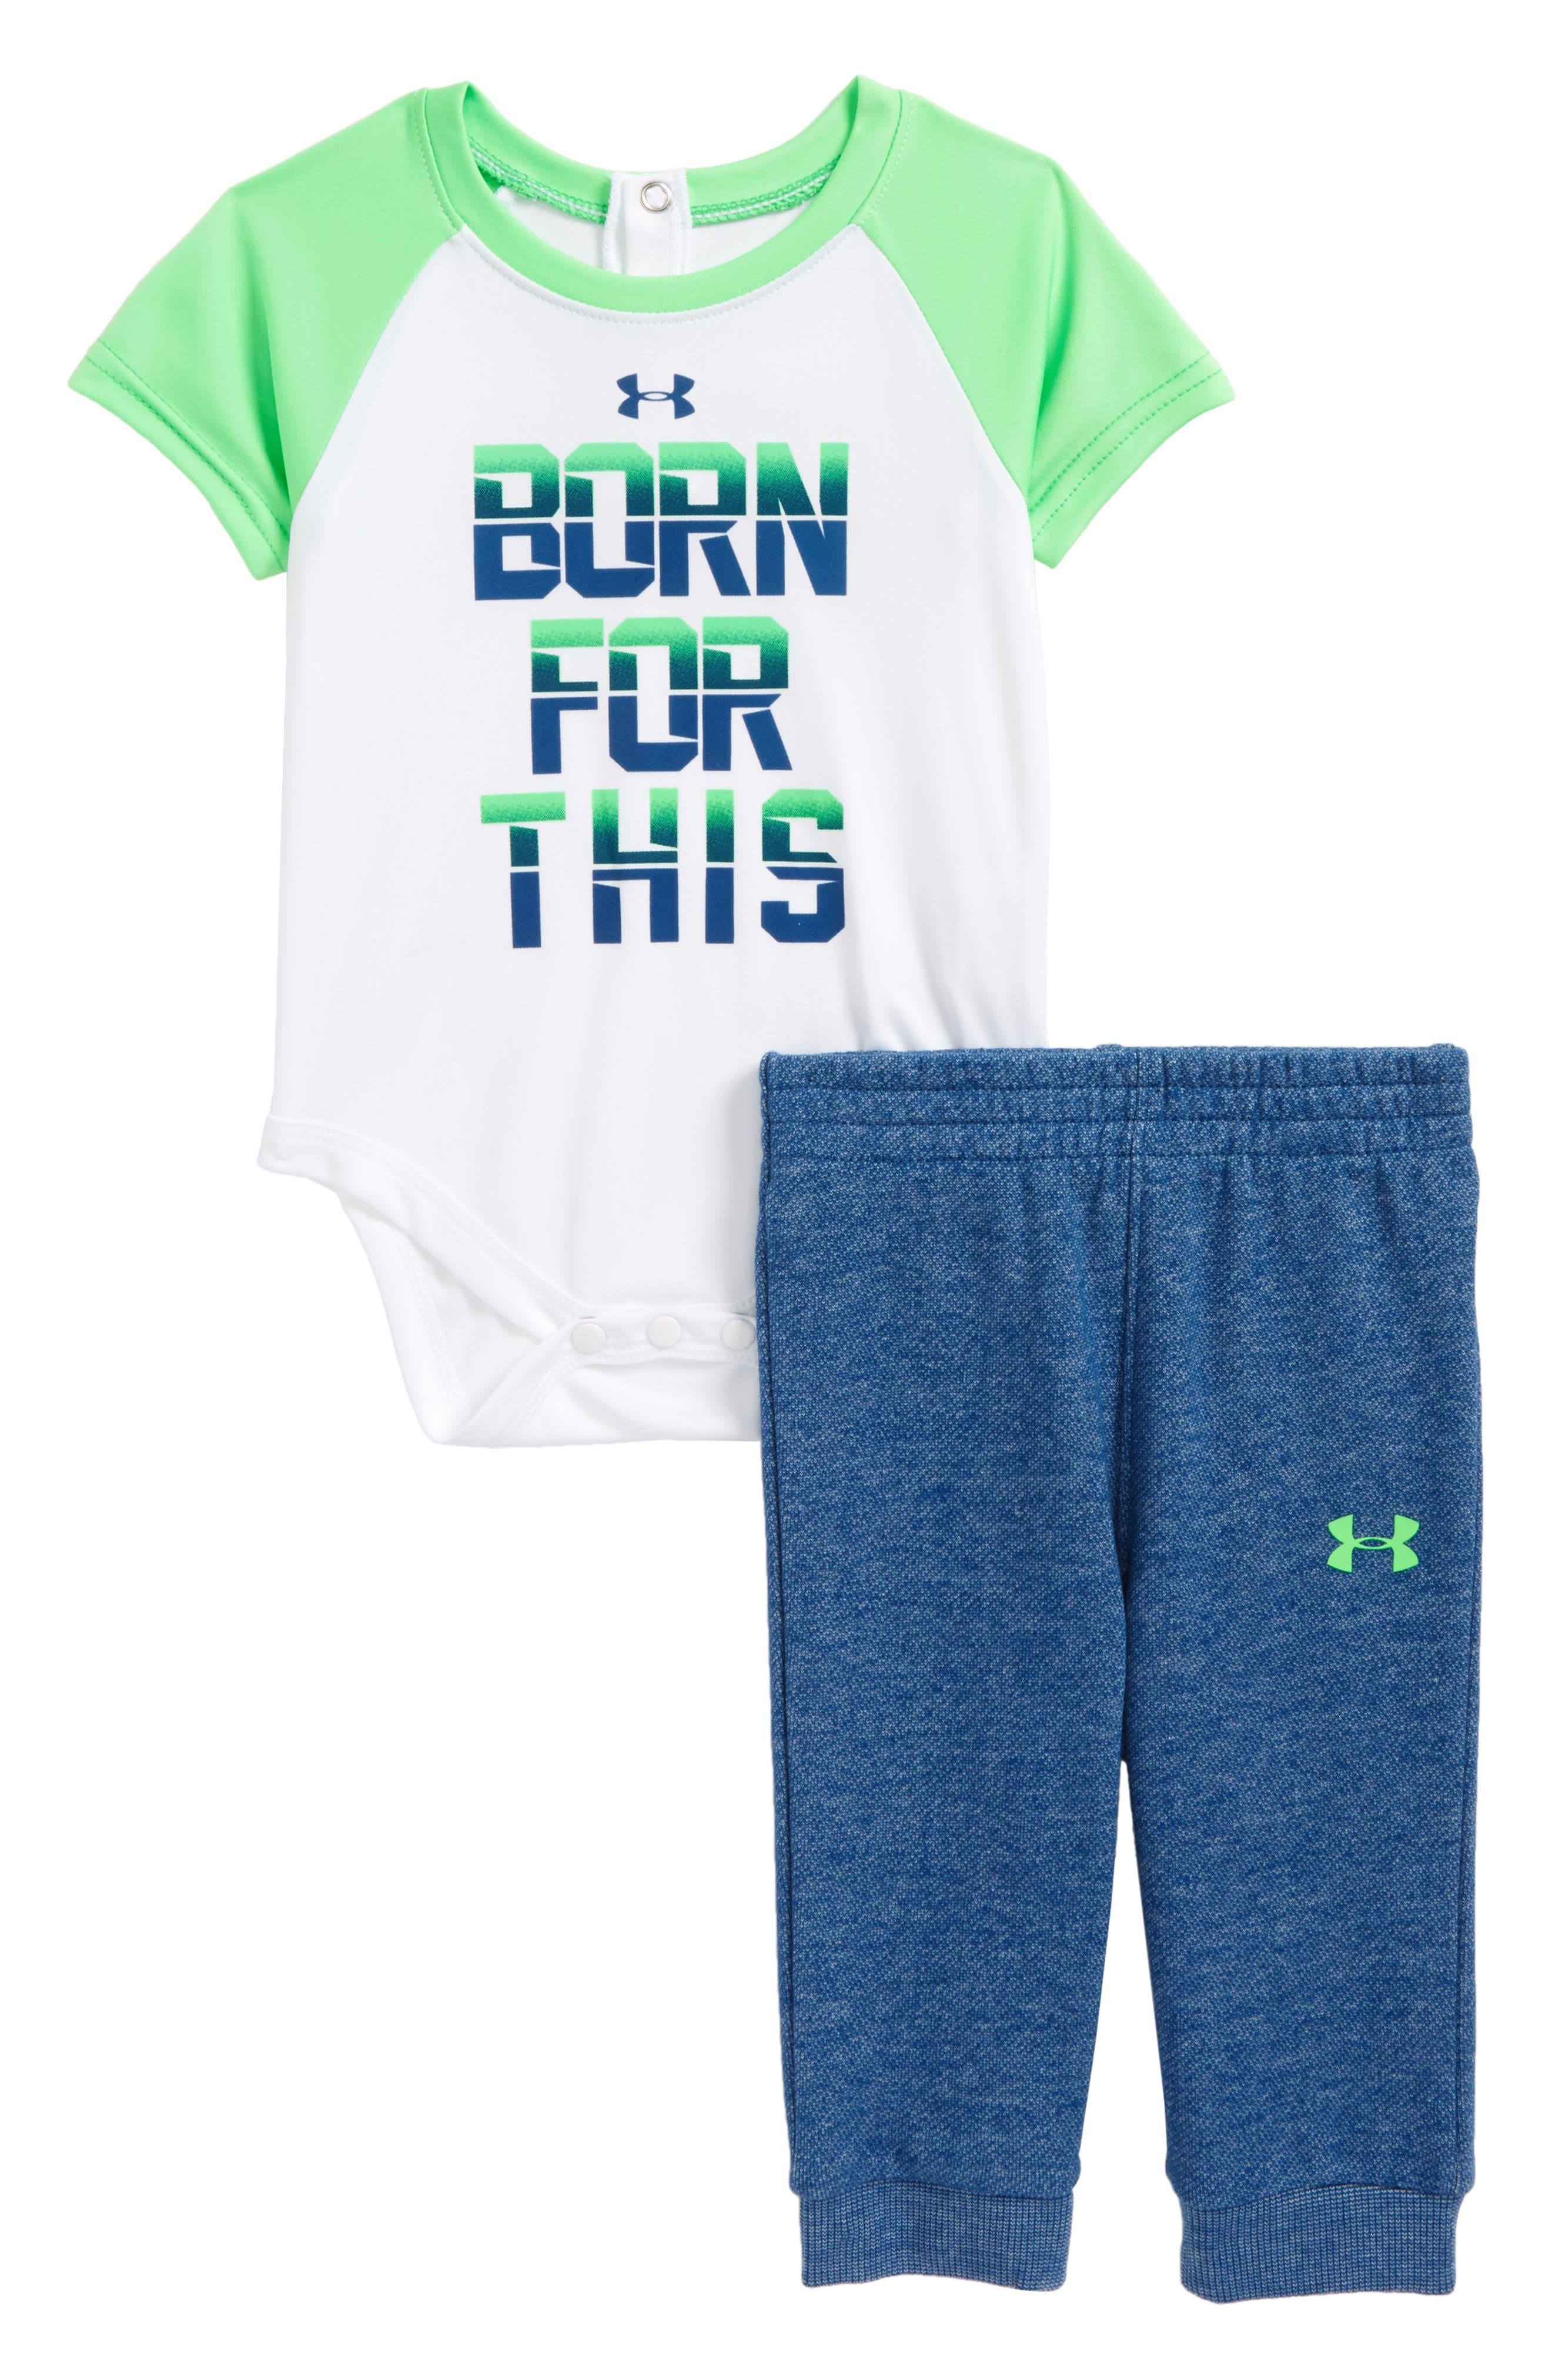 Born For This Bodysuit & Pants Set,                         Main,                         color, White